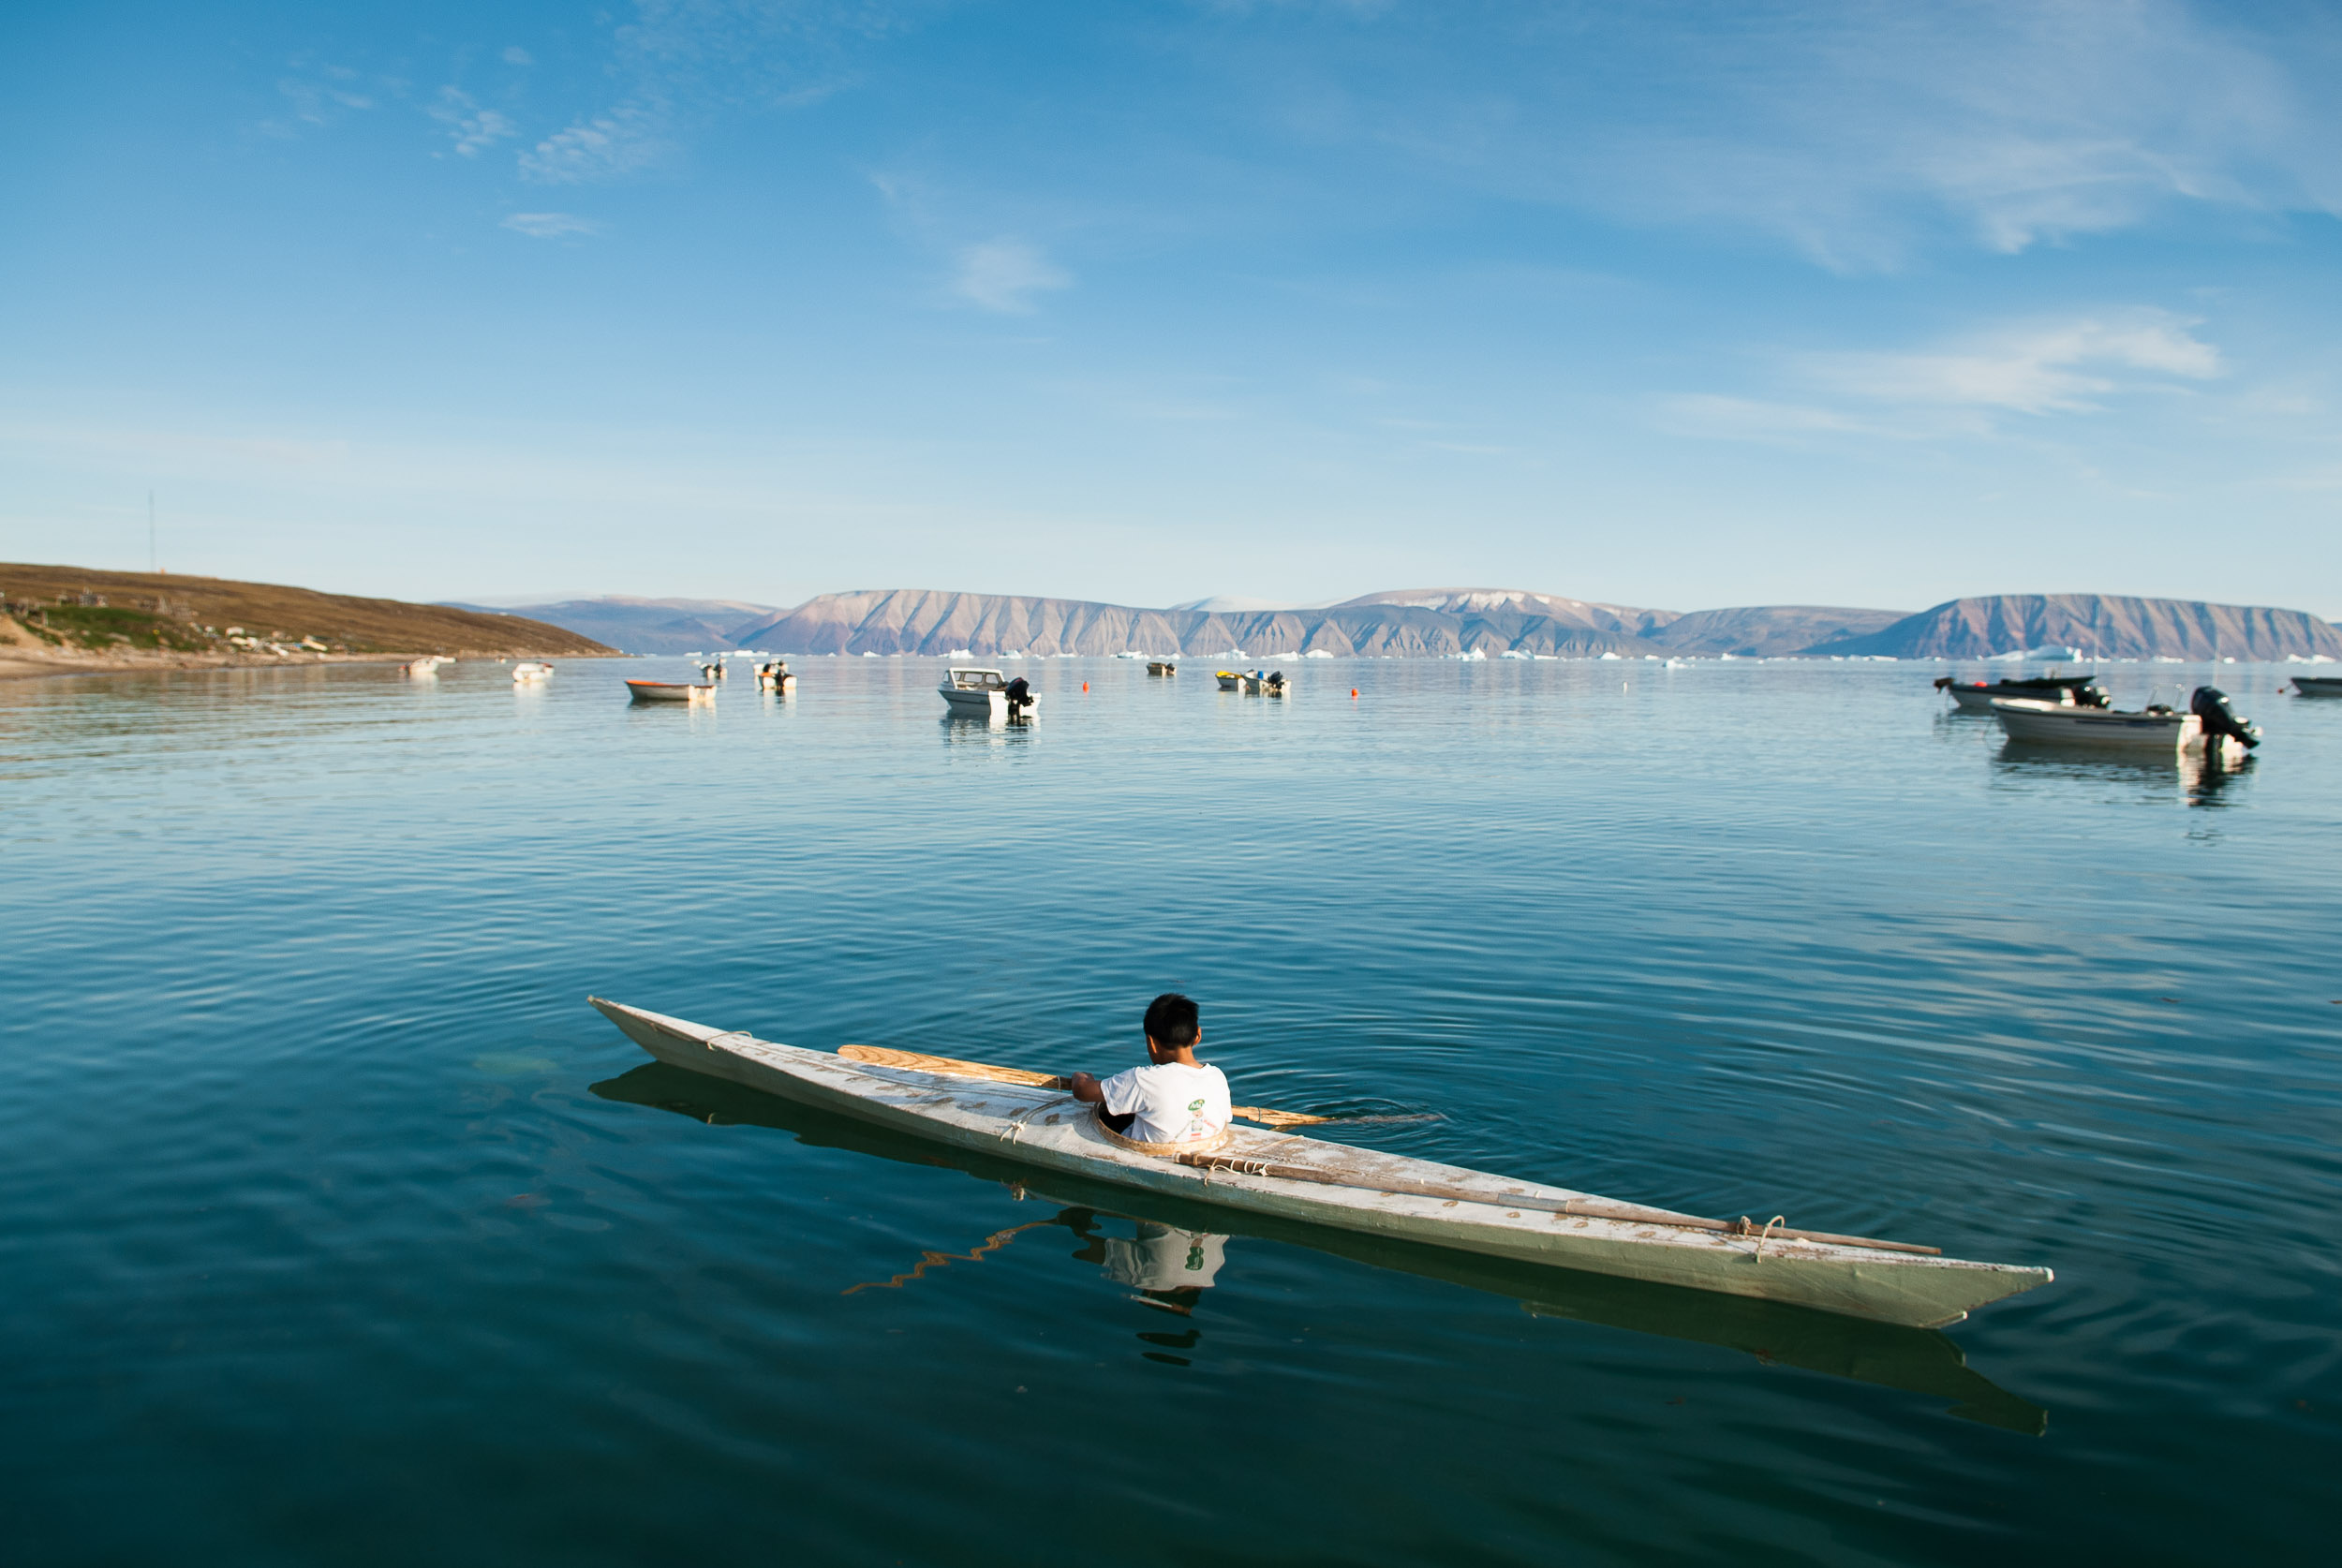 Inuit boy paddling a traditional sea kayak, Qaanaaq, Thule, Greenland.